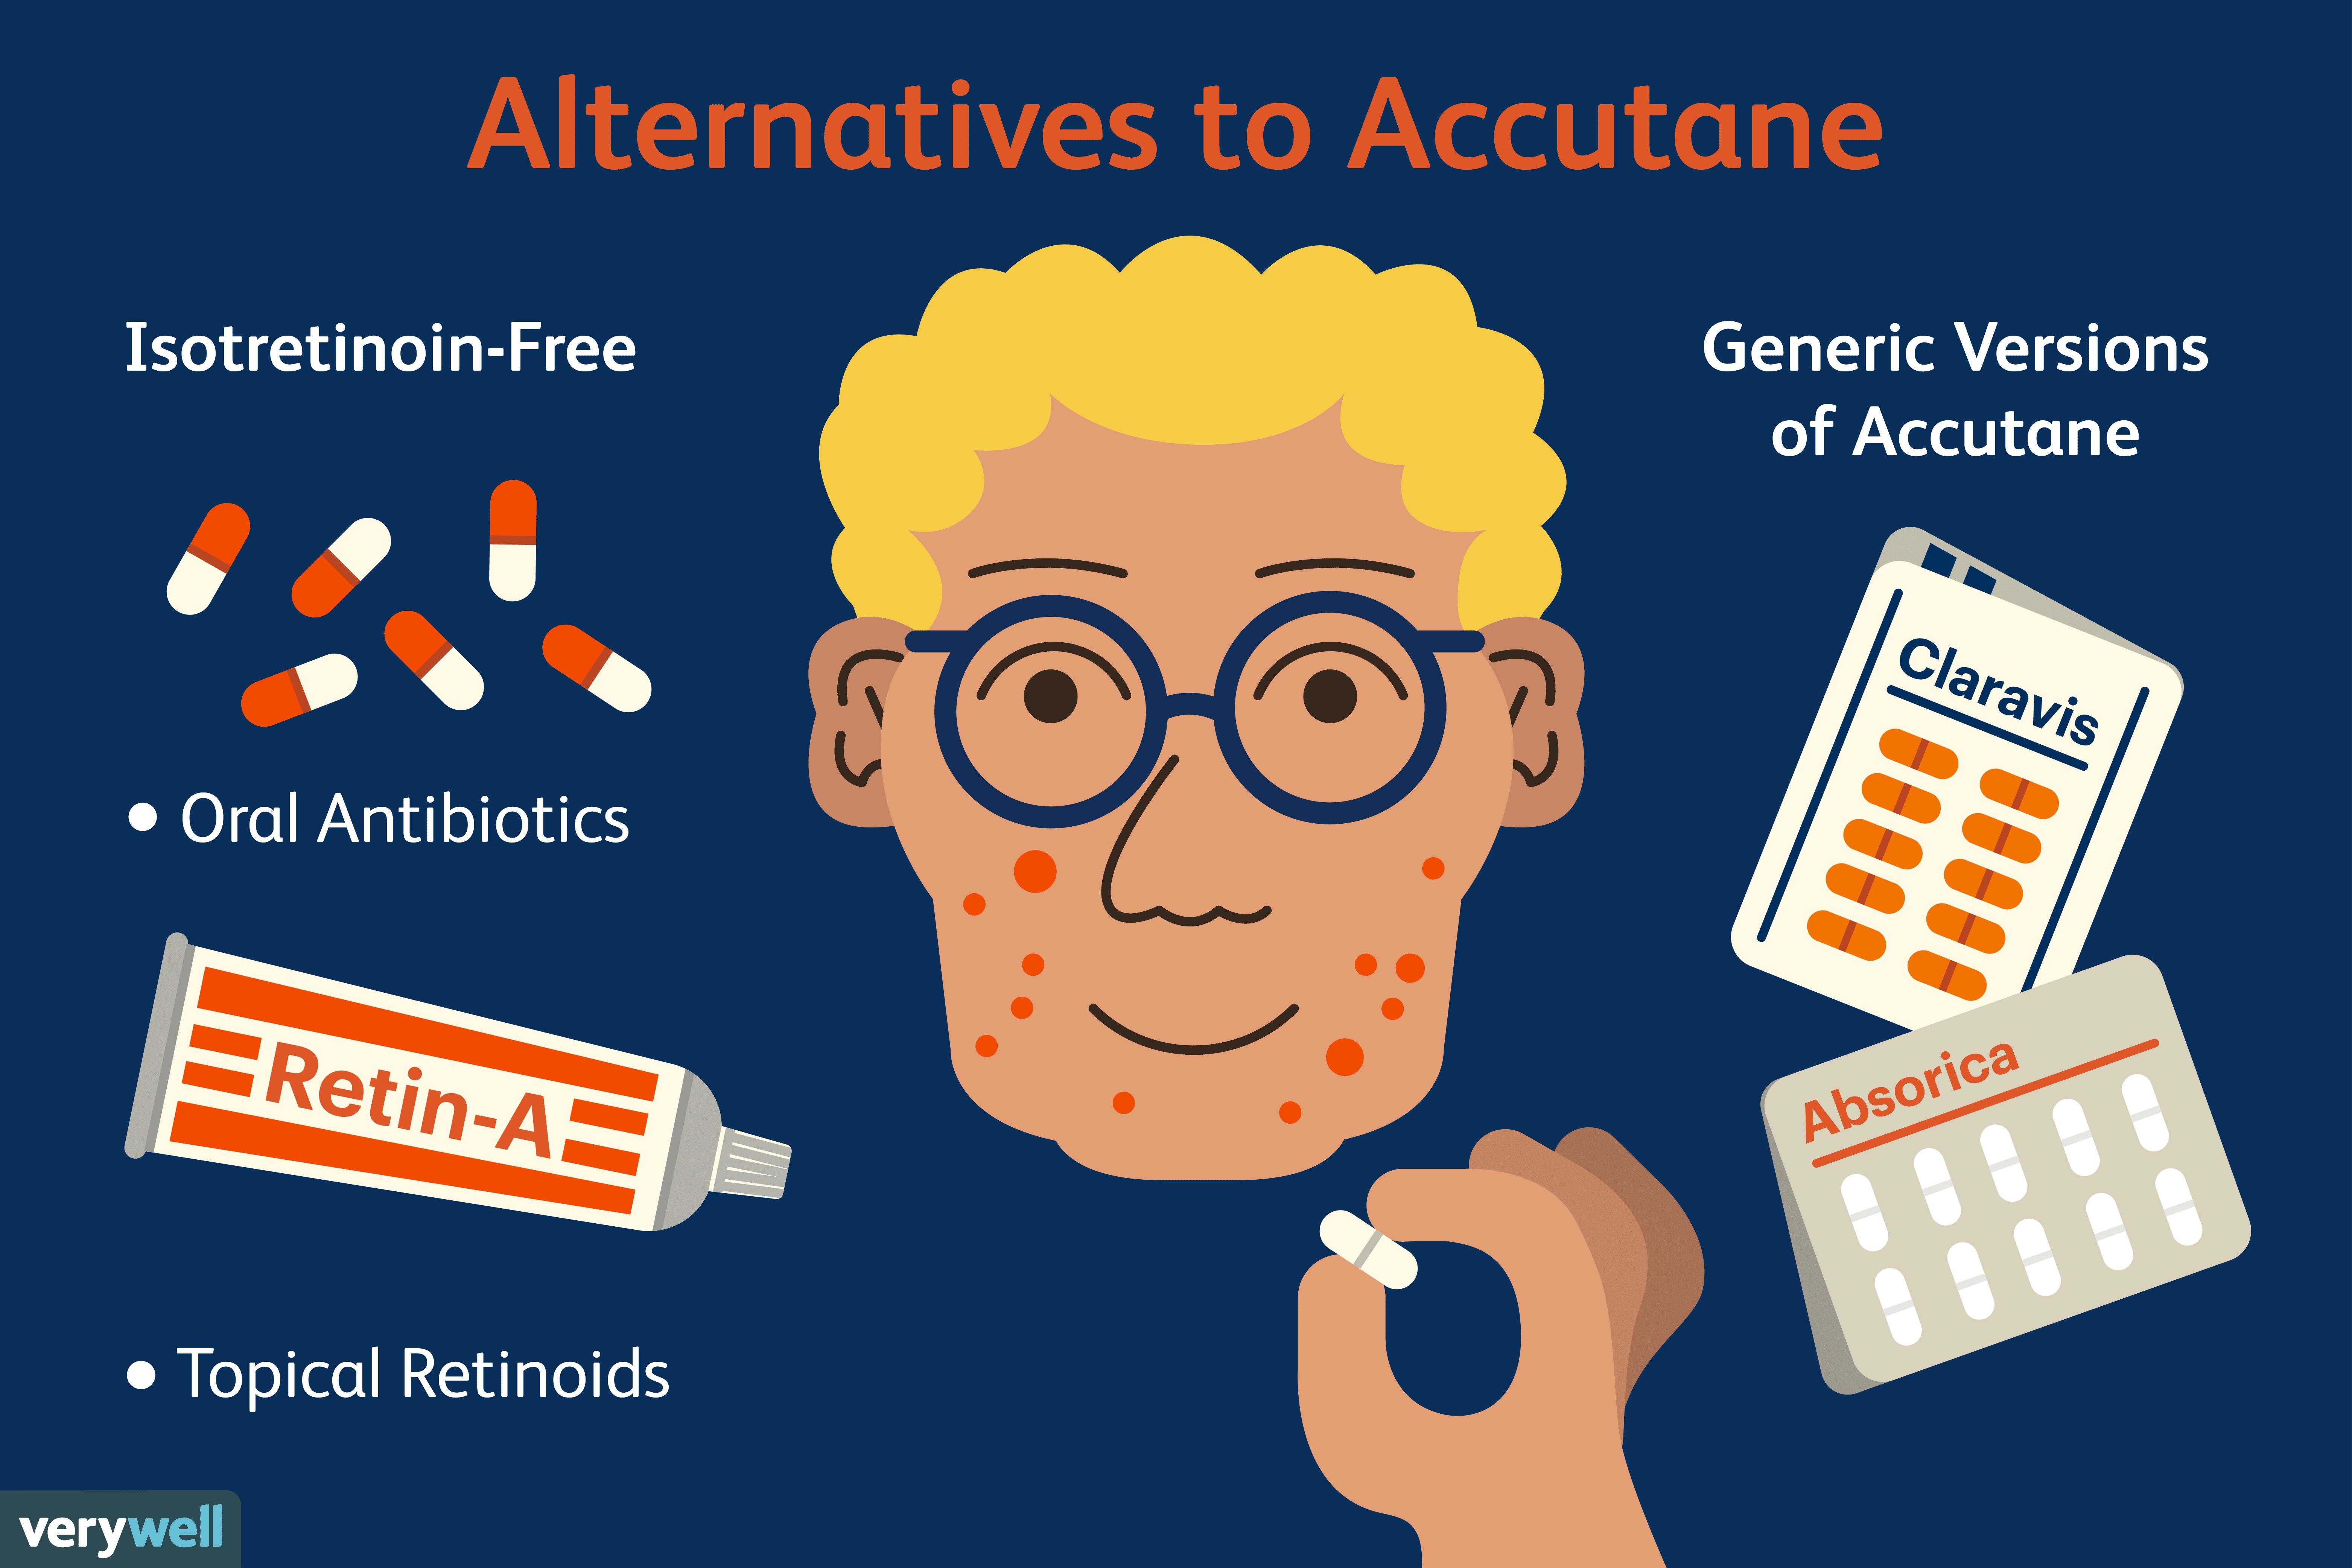 accutane alternatives